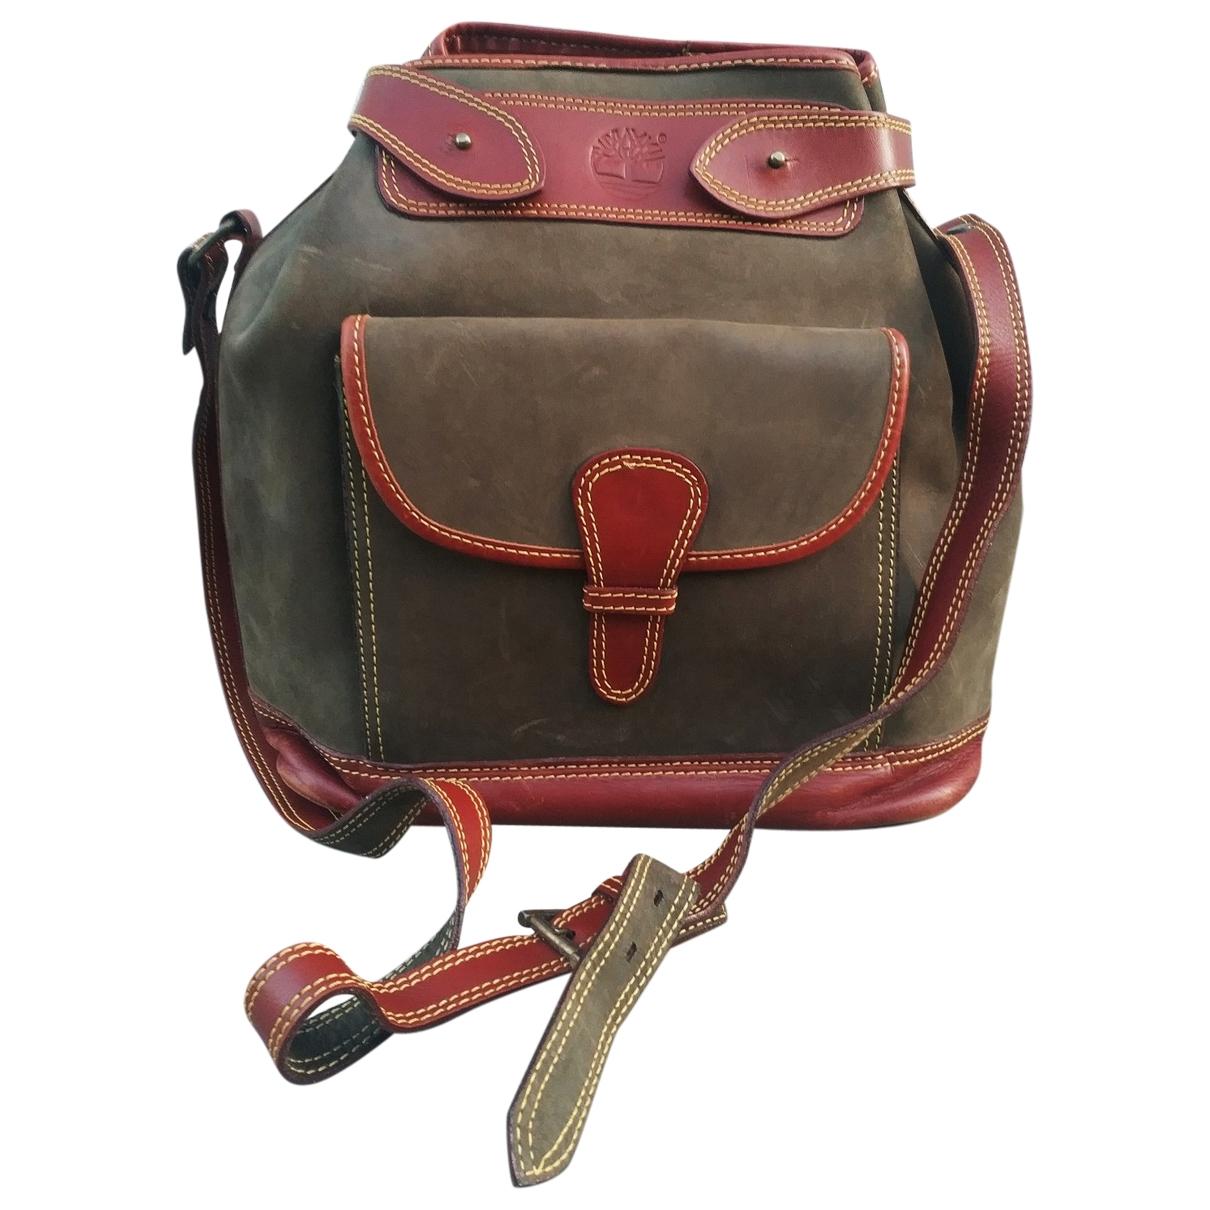 Timberland \N Green Leather handbag for Women \N